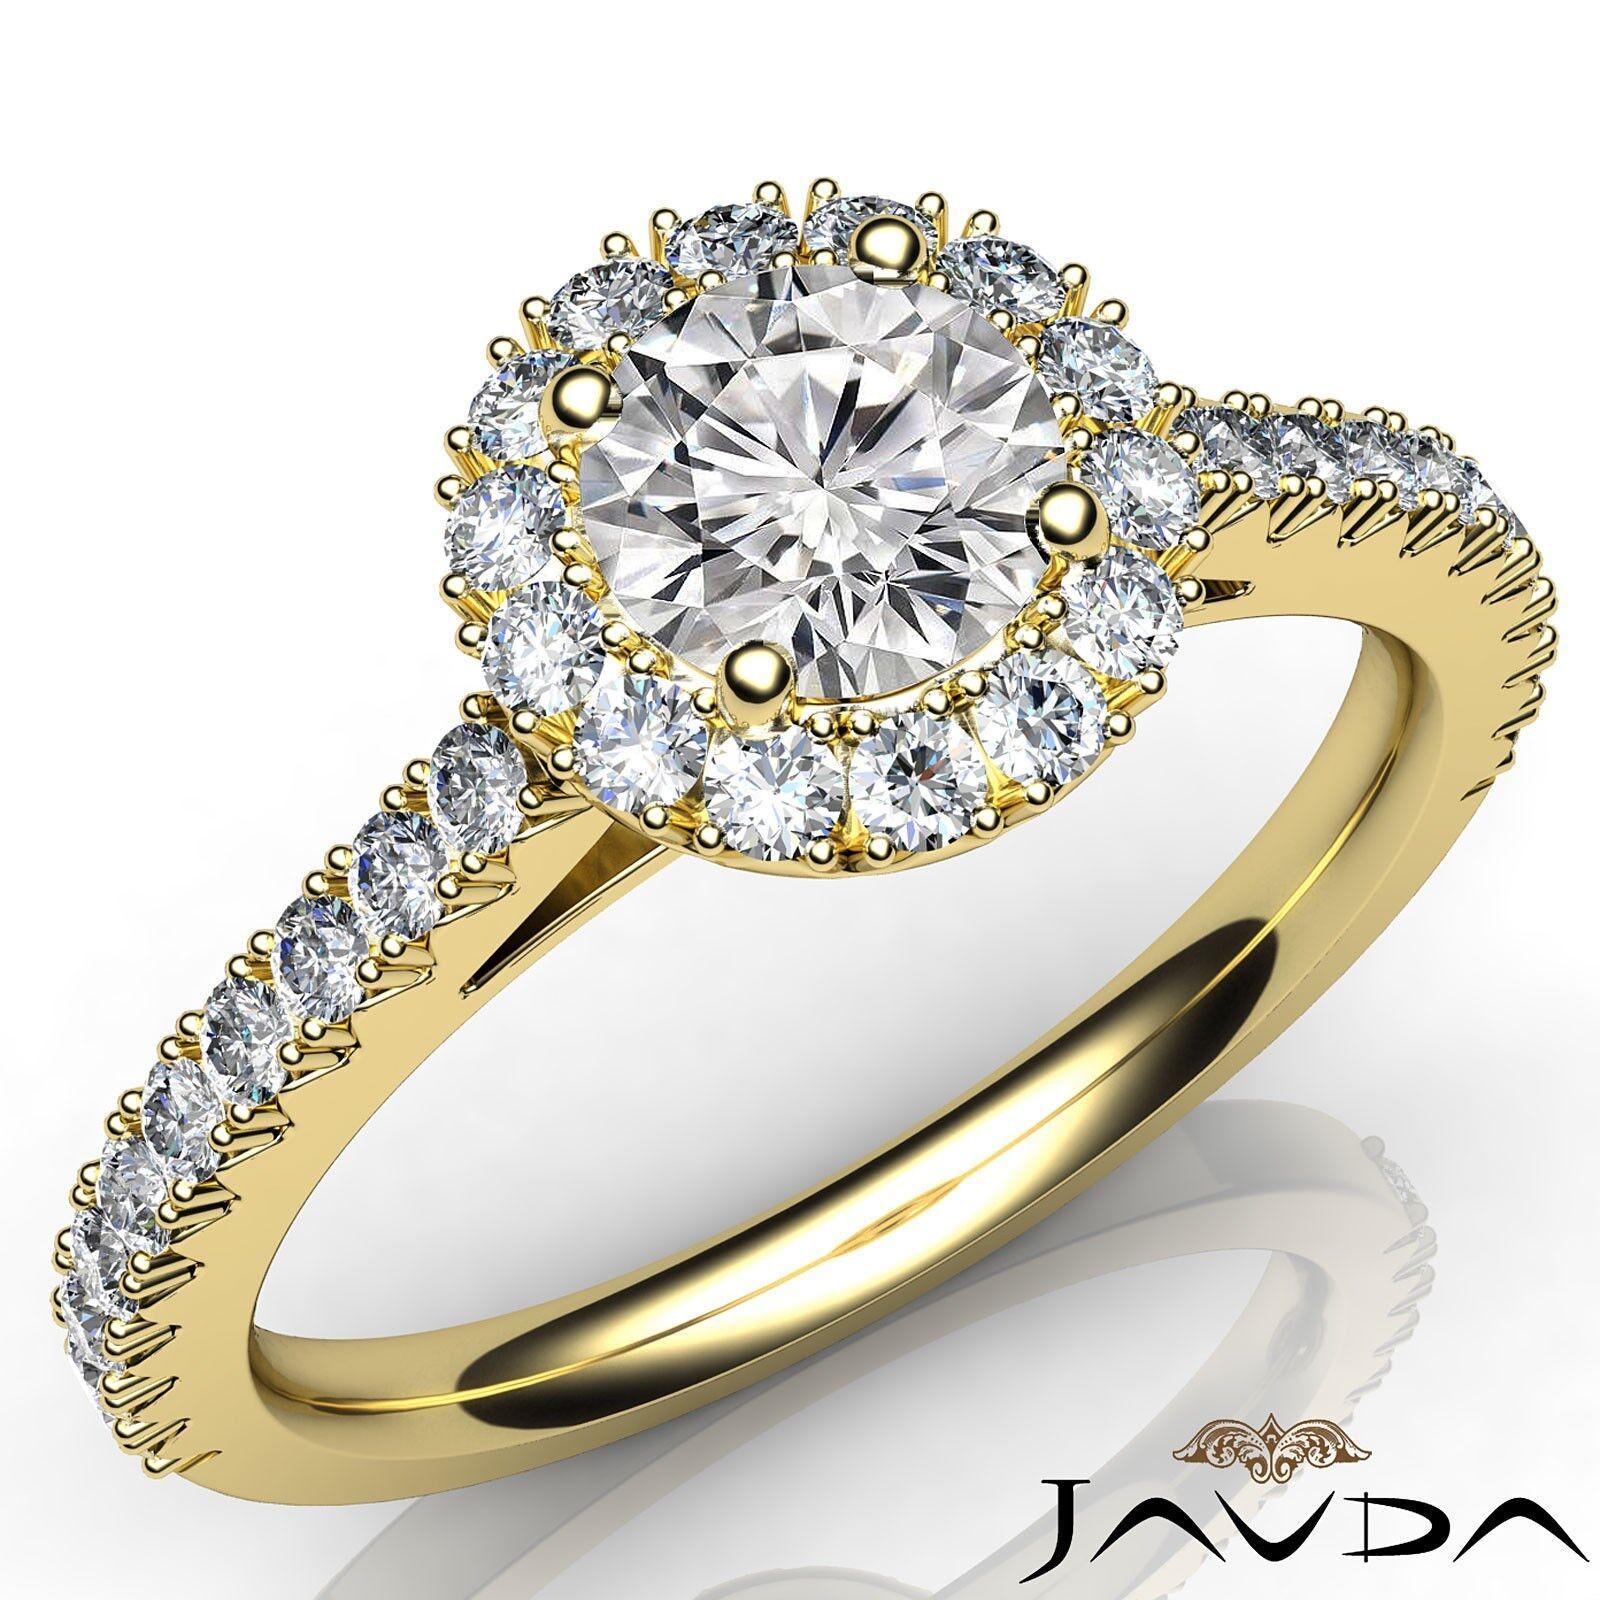 Halo Double Prong Round Shape Diamond Engagement Wedding Ring GIA F SI1 1.5 Ct